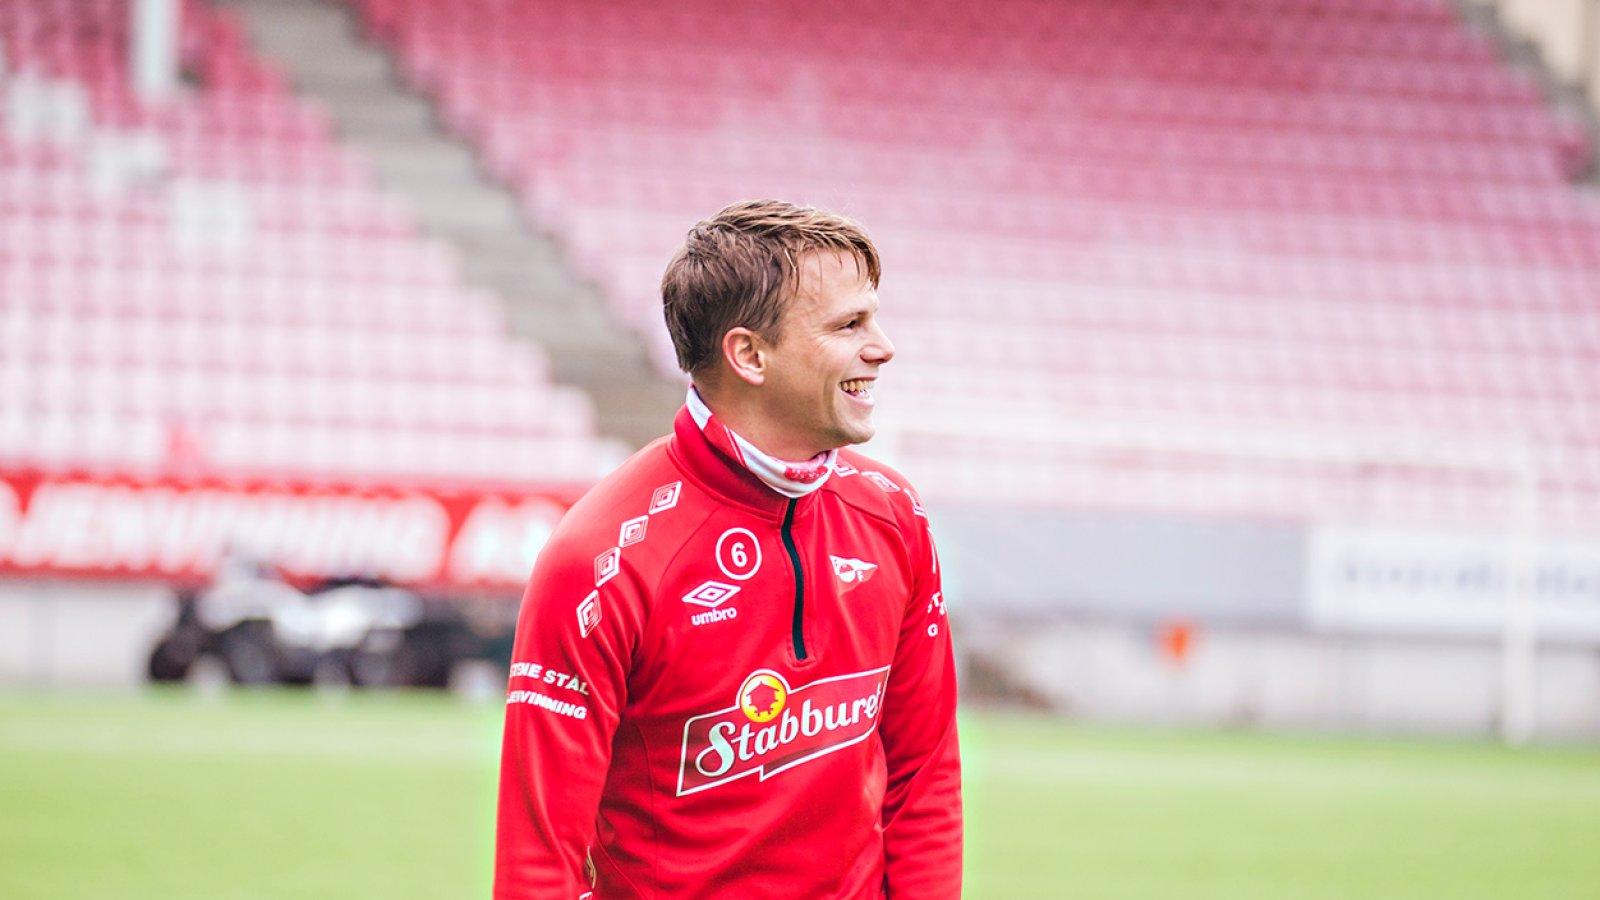 Andrea Loberto presentert som ny hovedtrener i FFK - Patrik Karoliussen trener